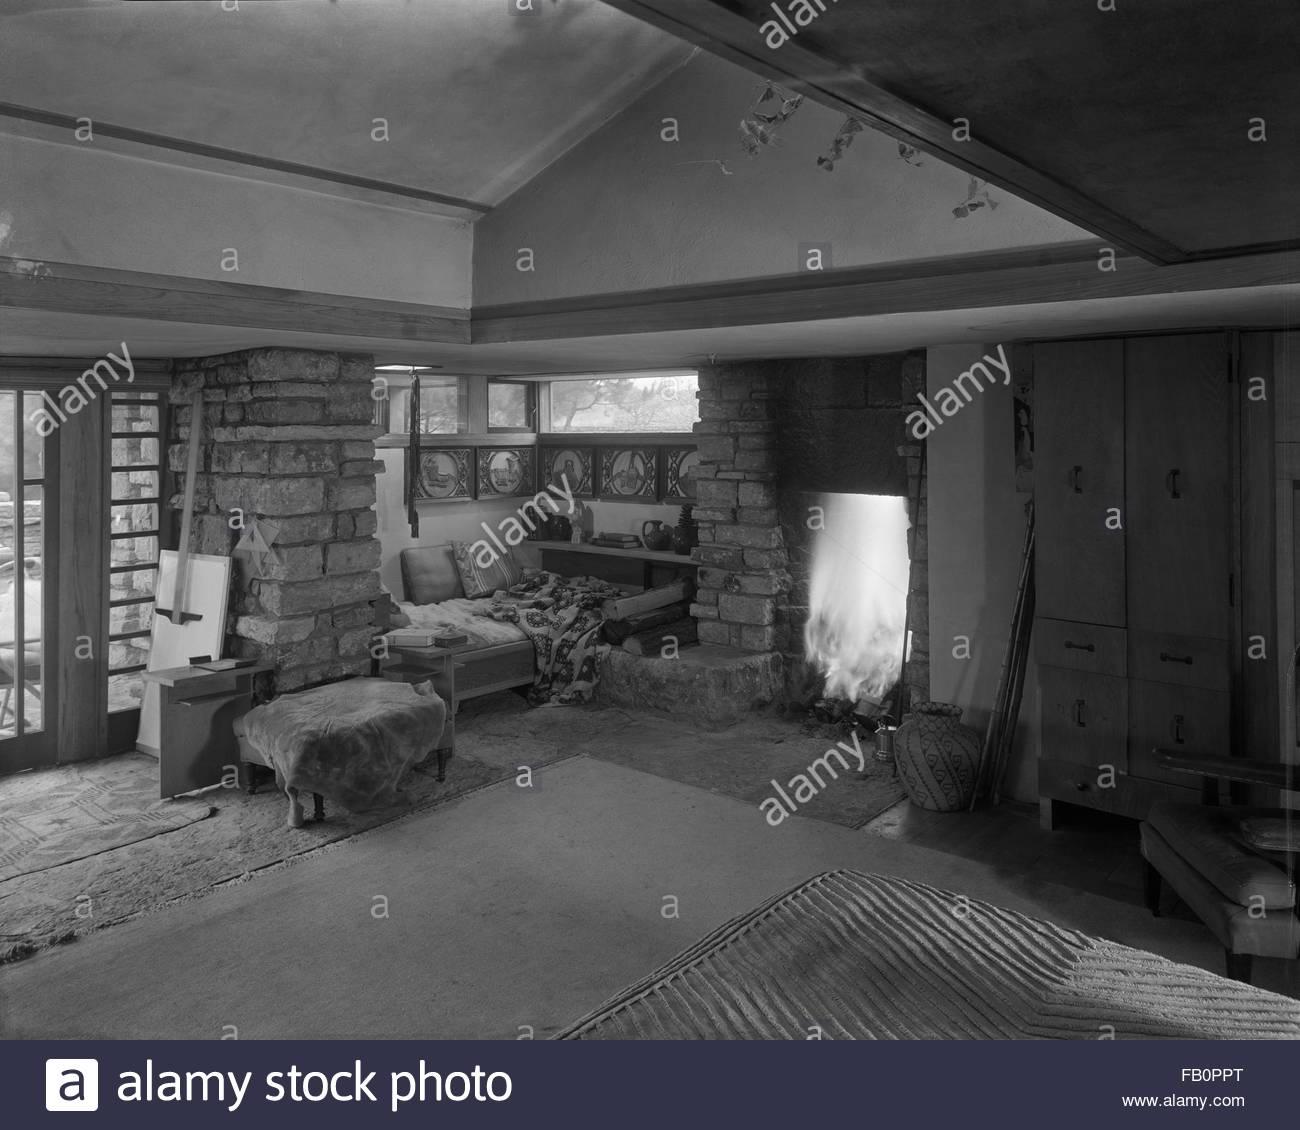 Taliesin East in Spring Green (Wis.), 1937 Dec. Living room corner ...